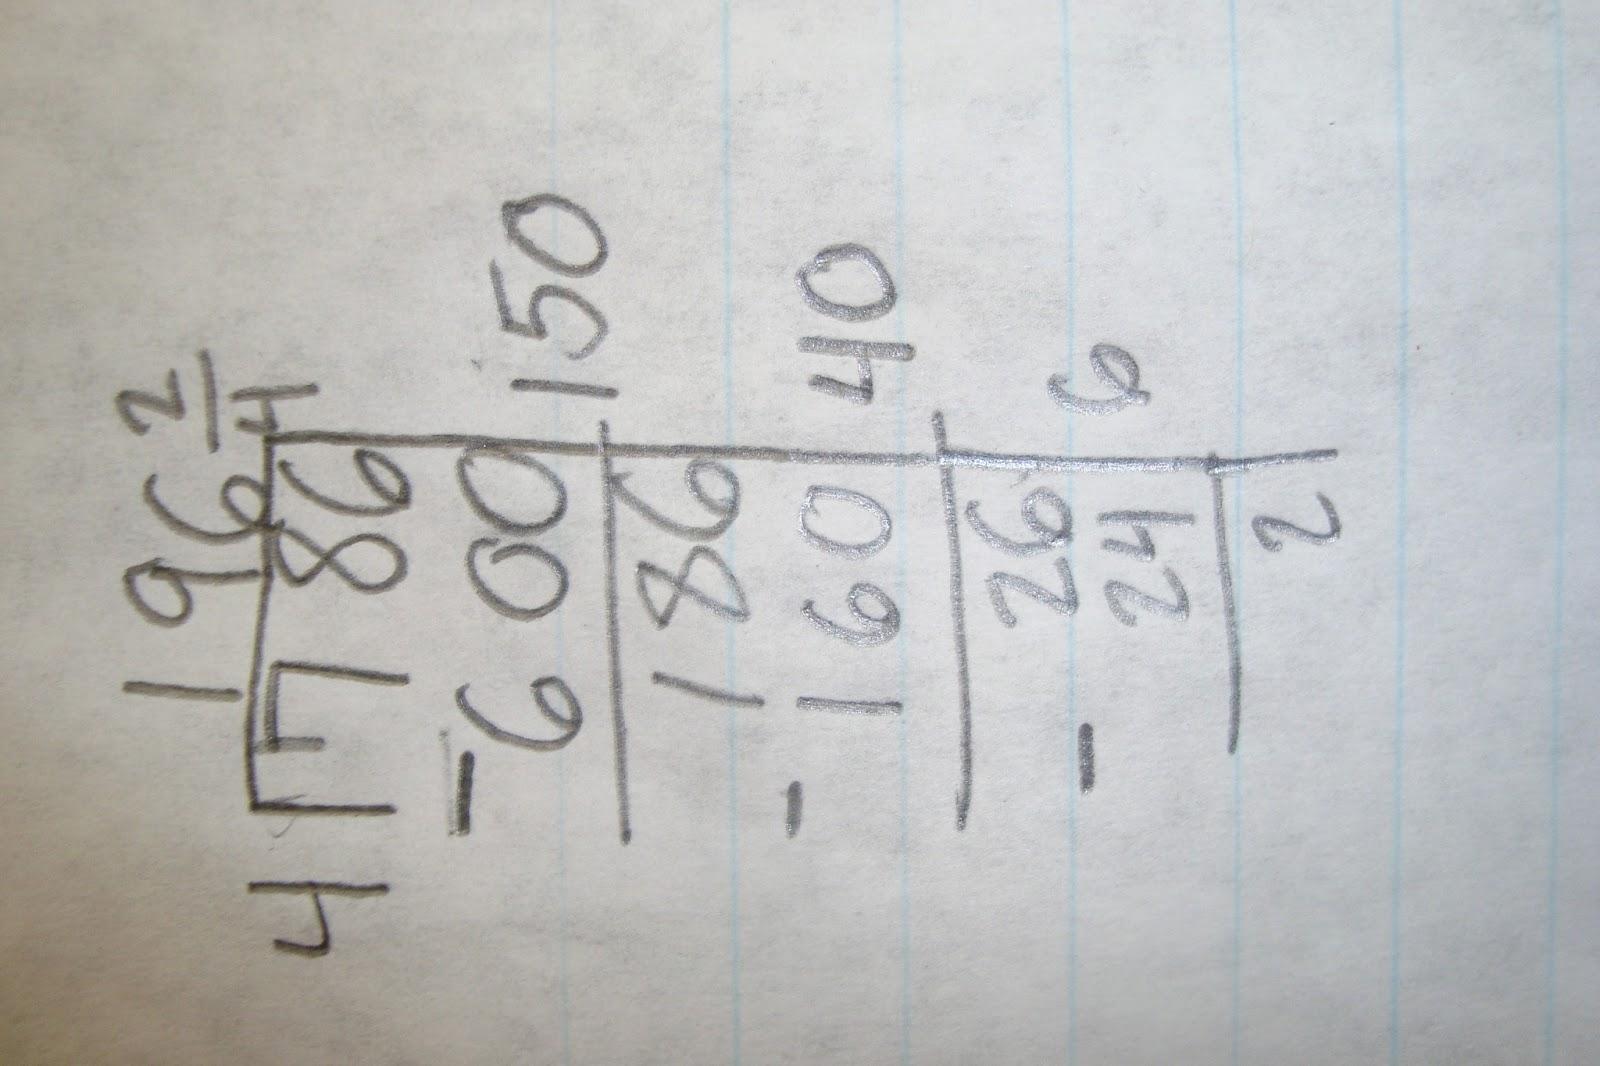 Long Division Strategies 5th Grade